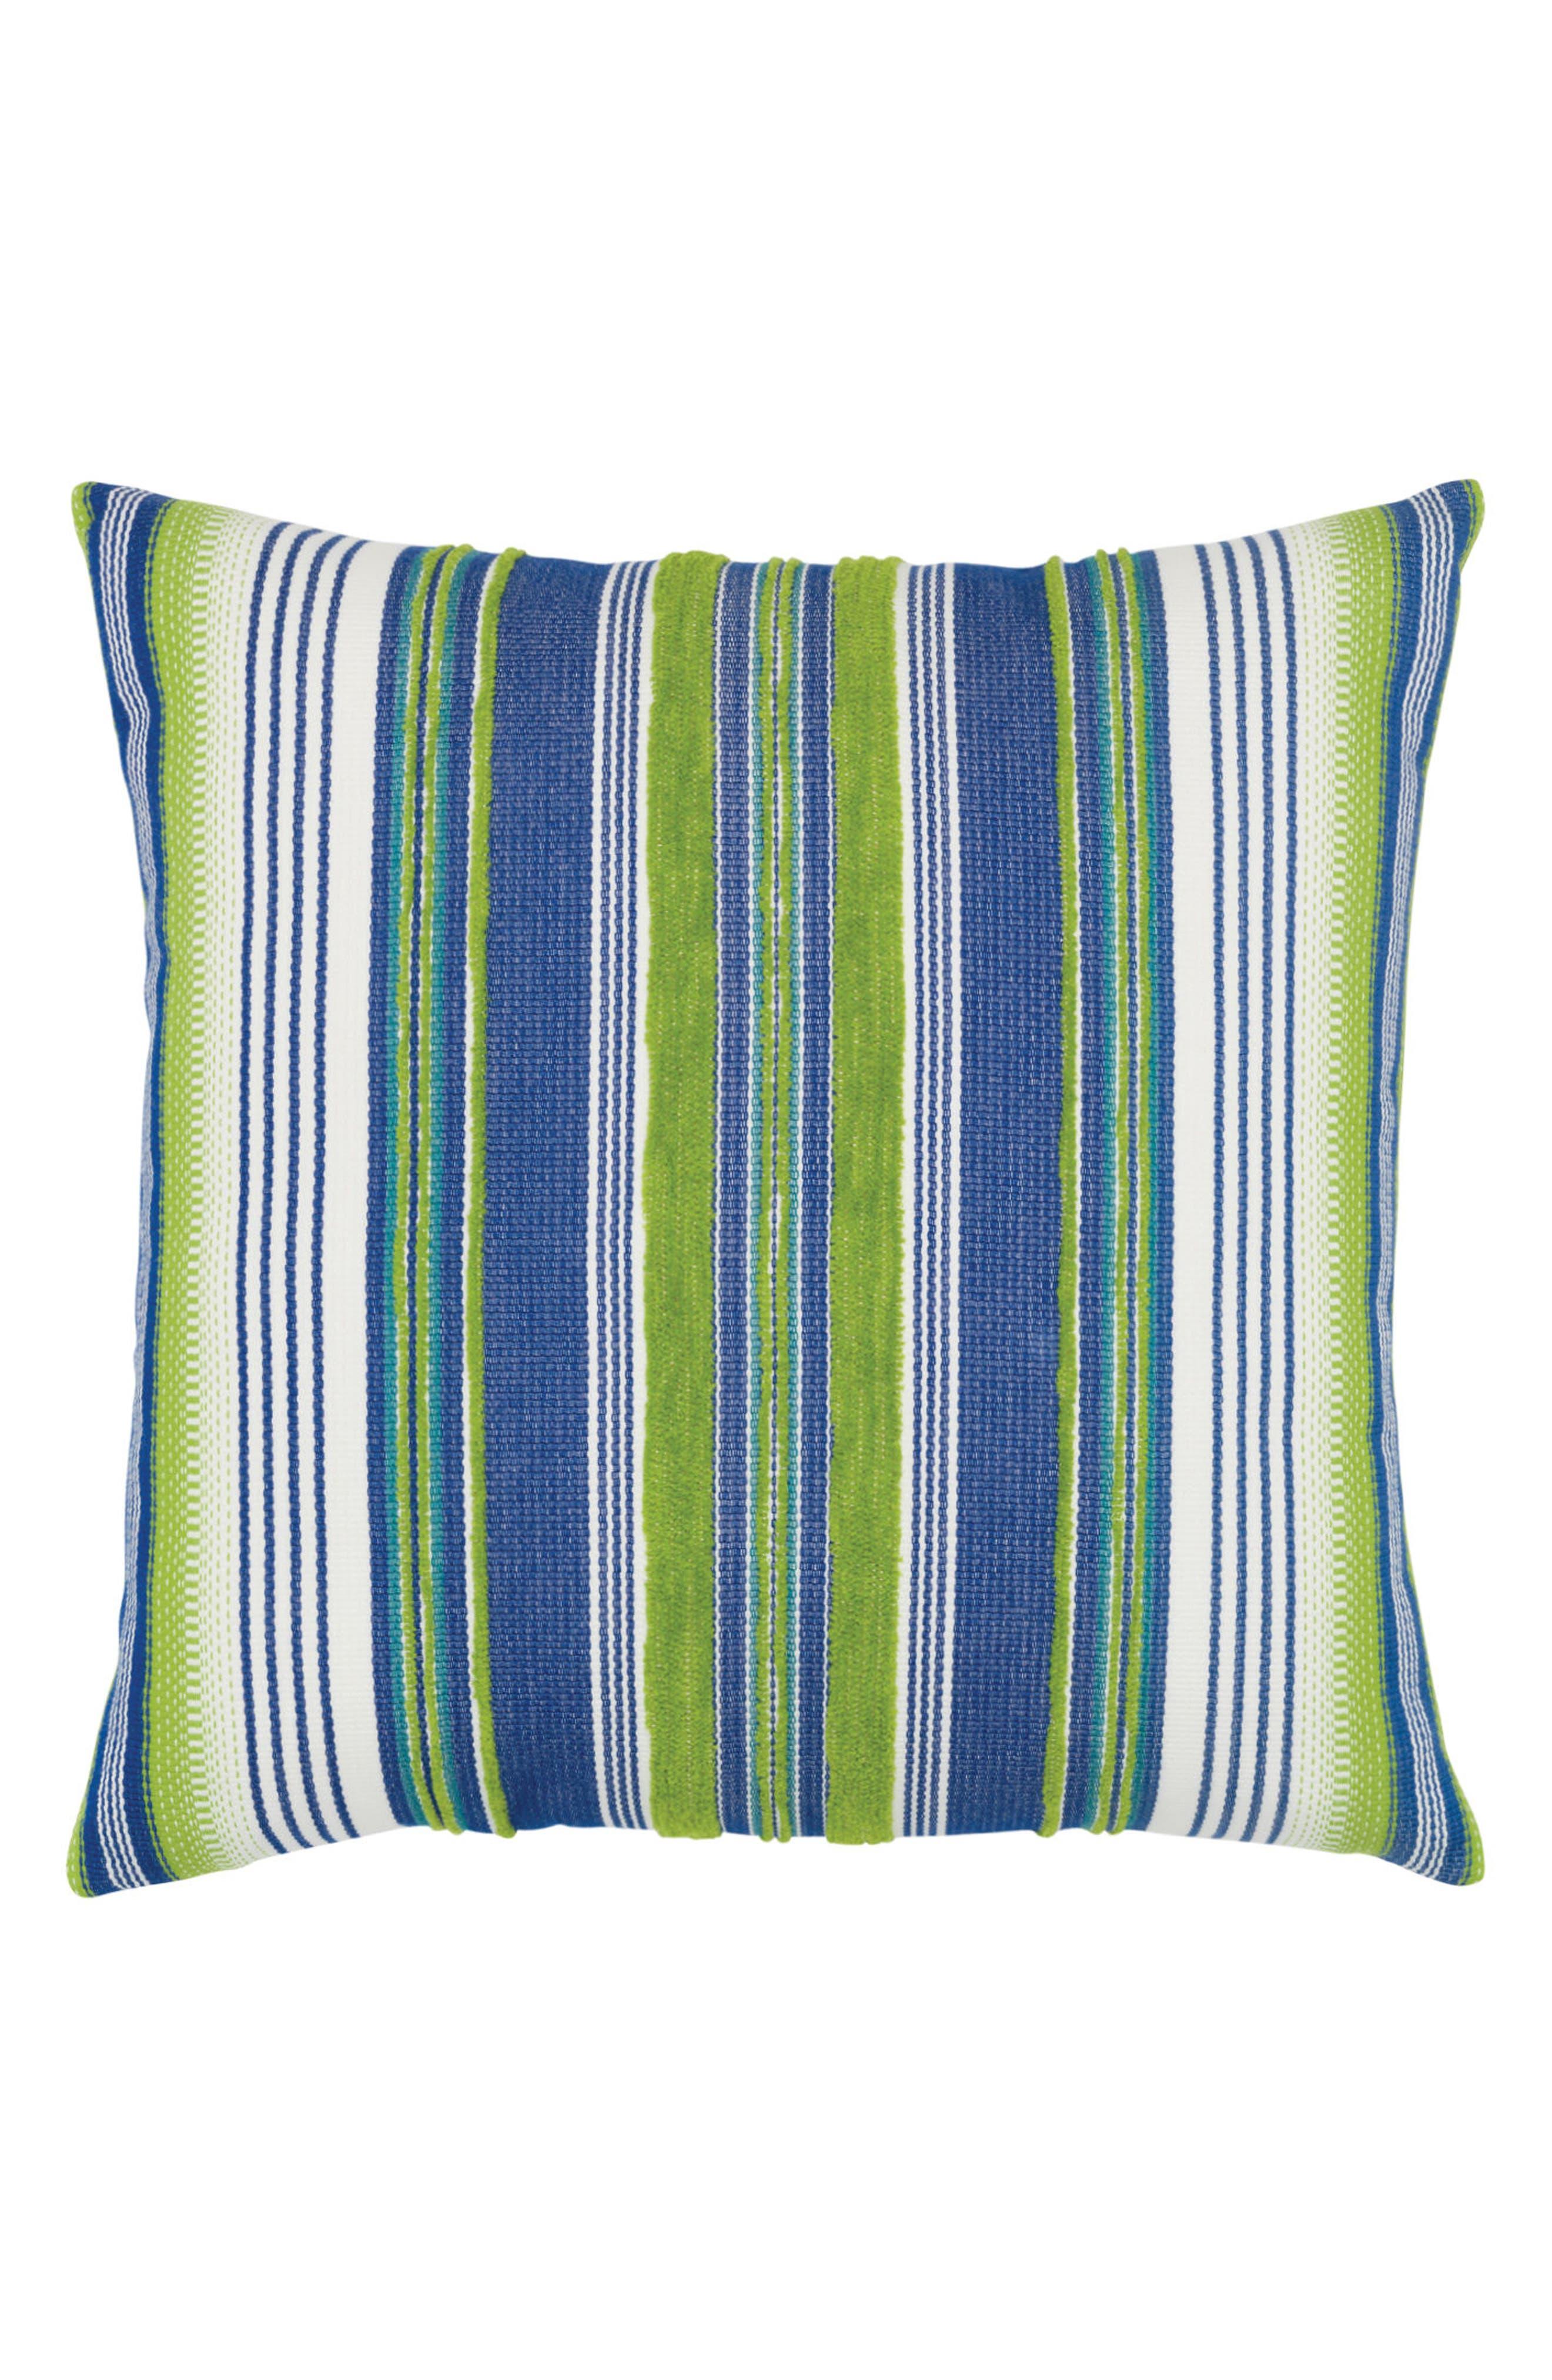 Deep Sea Stripe Indoor/Outdoor Accent Pillow,                             Main thumbnail 1, color,                             Blue/ Green